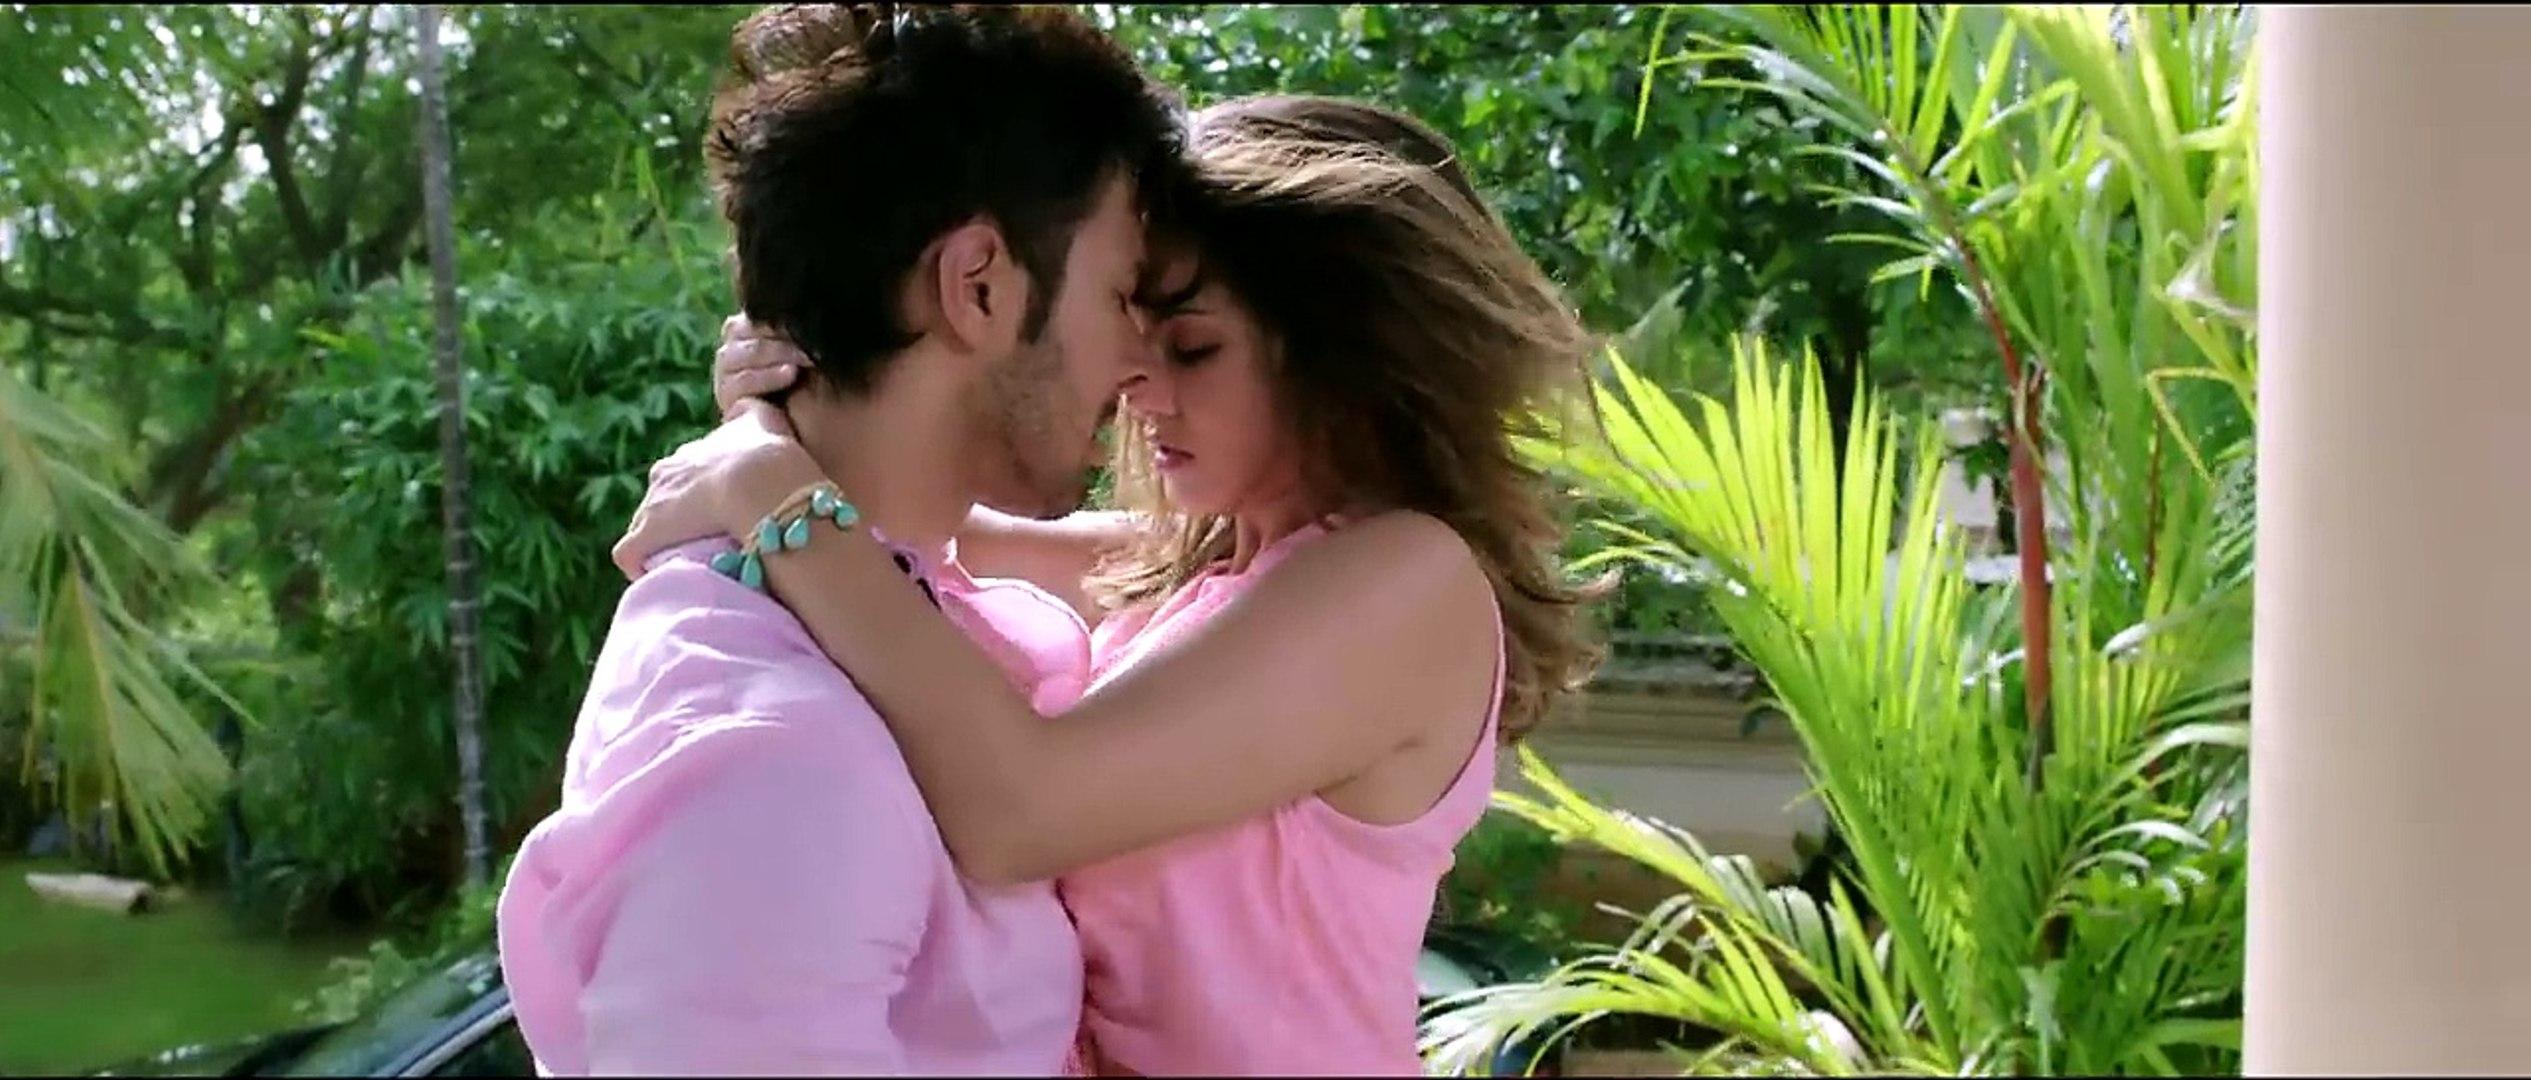 Beiimaan Love - Extended Trailer - Sunny Leone & Rajniesh Duggall - 14th October